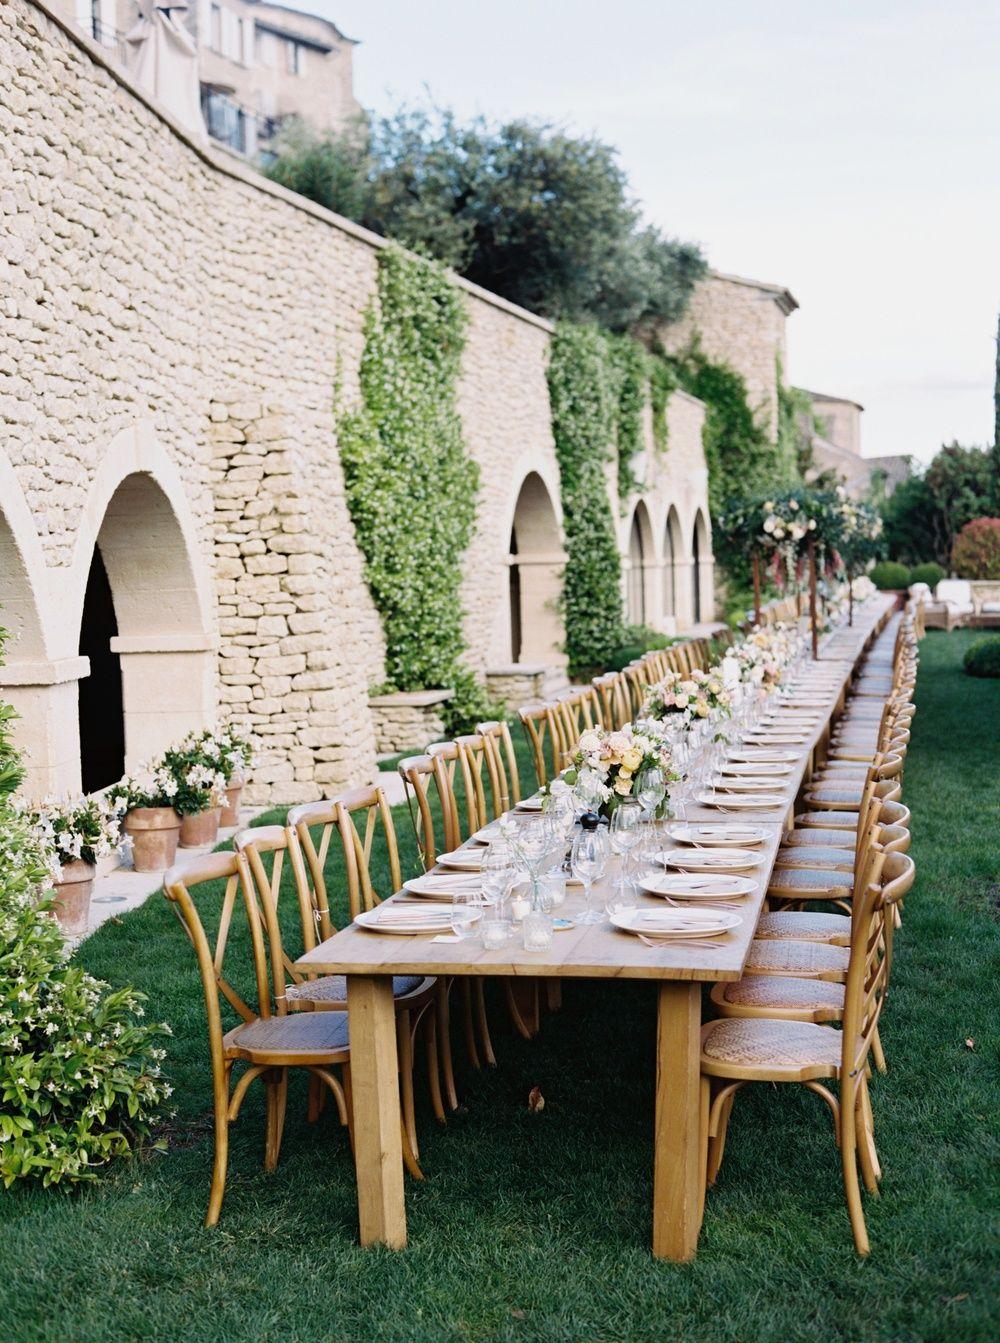 Idyllic Chateau Wedding In The South Of France Courtyard Wedding